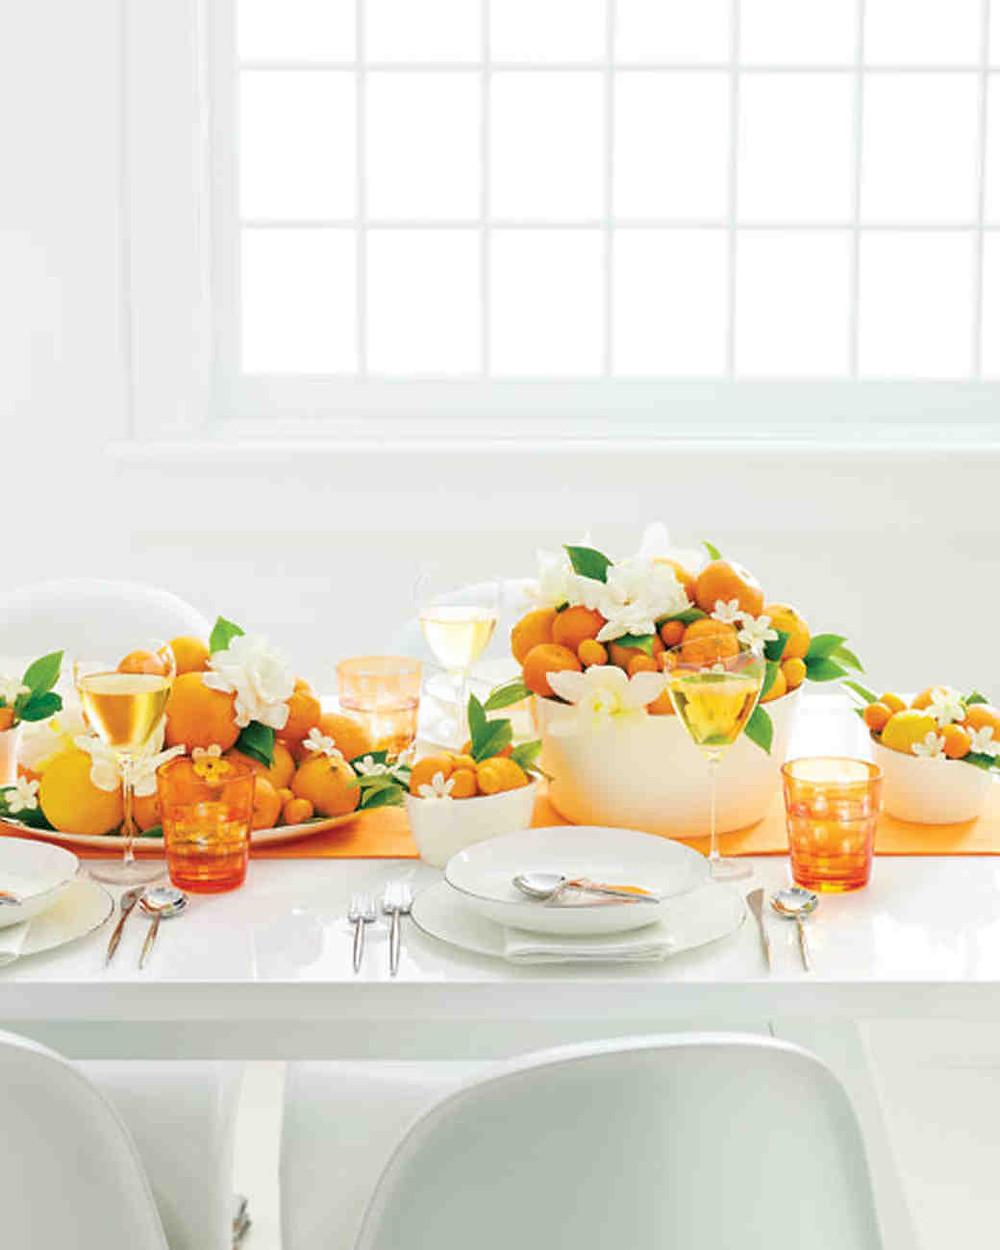 Orange wedding 2019 trends fruit table setting